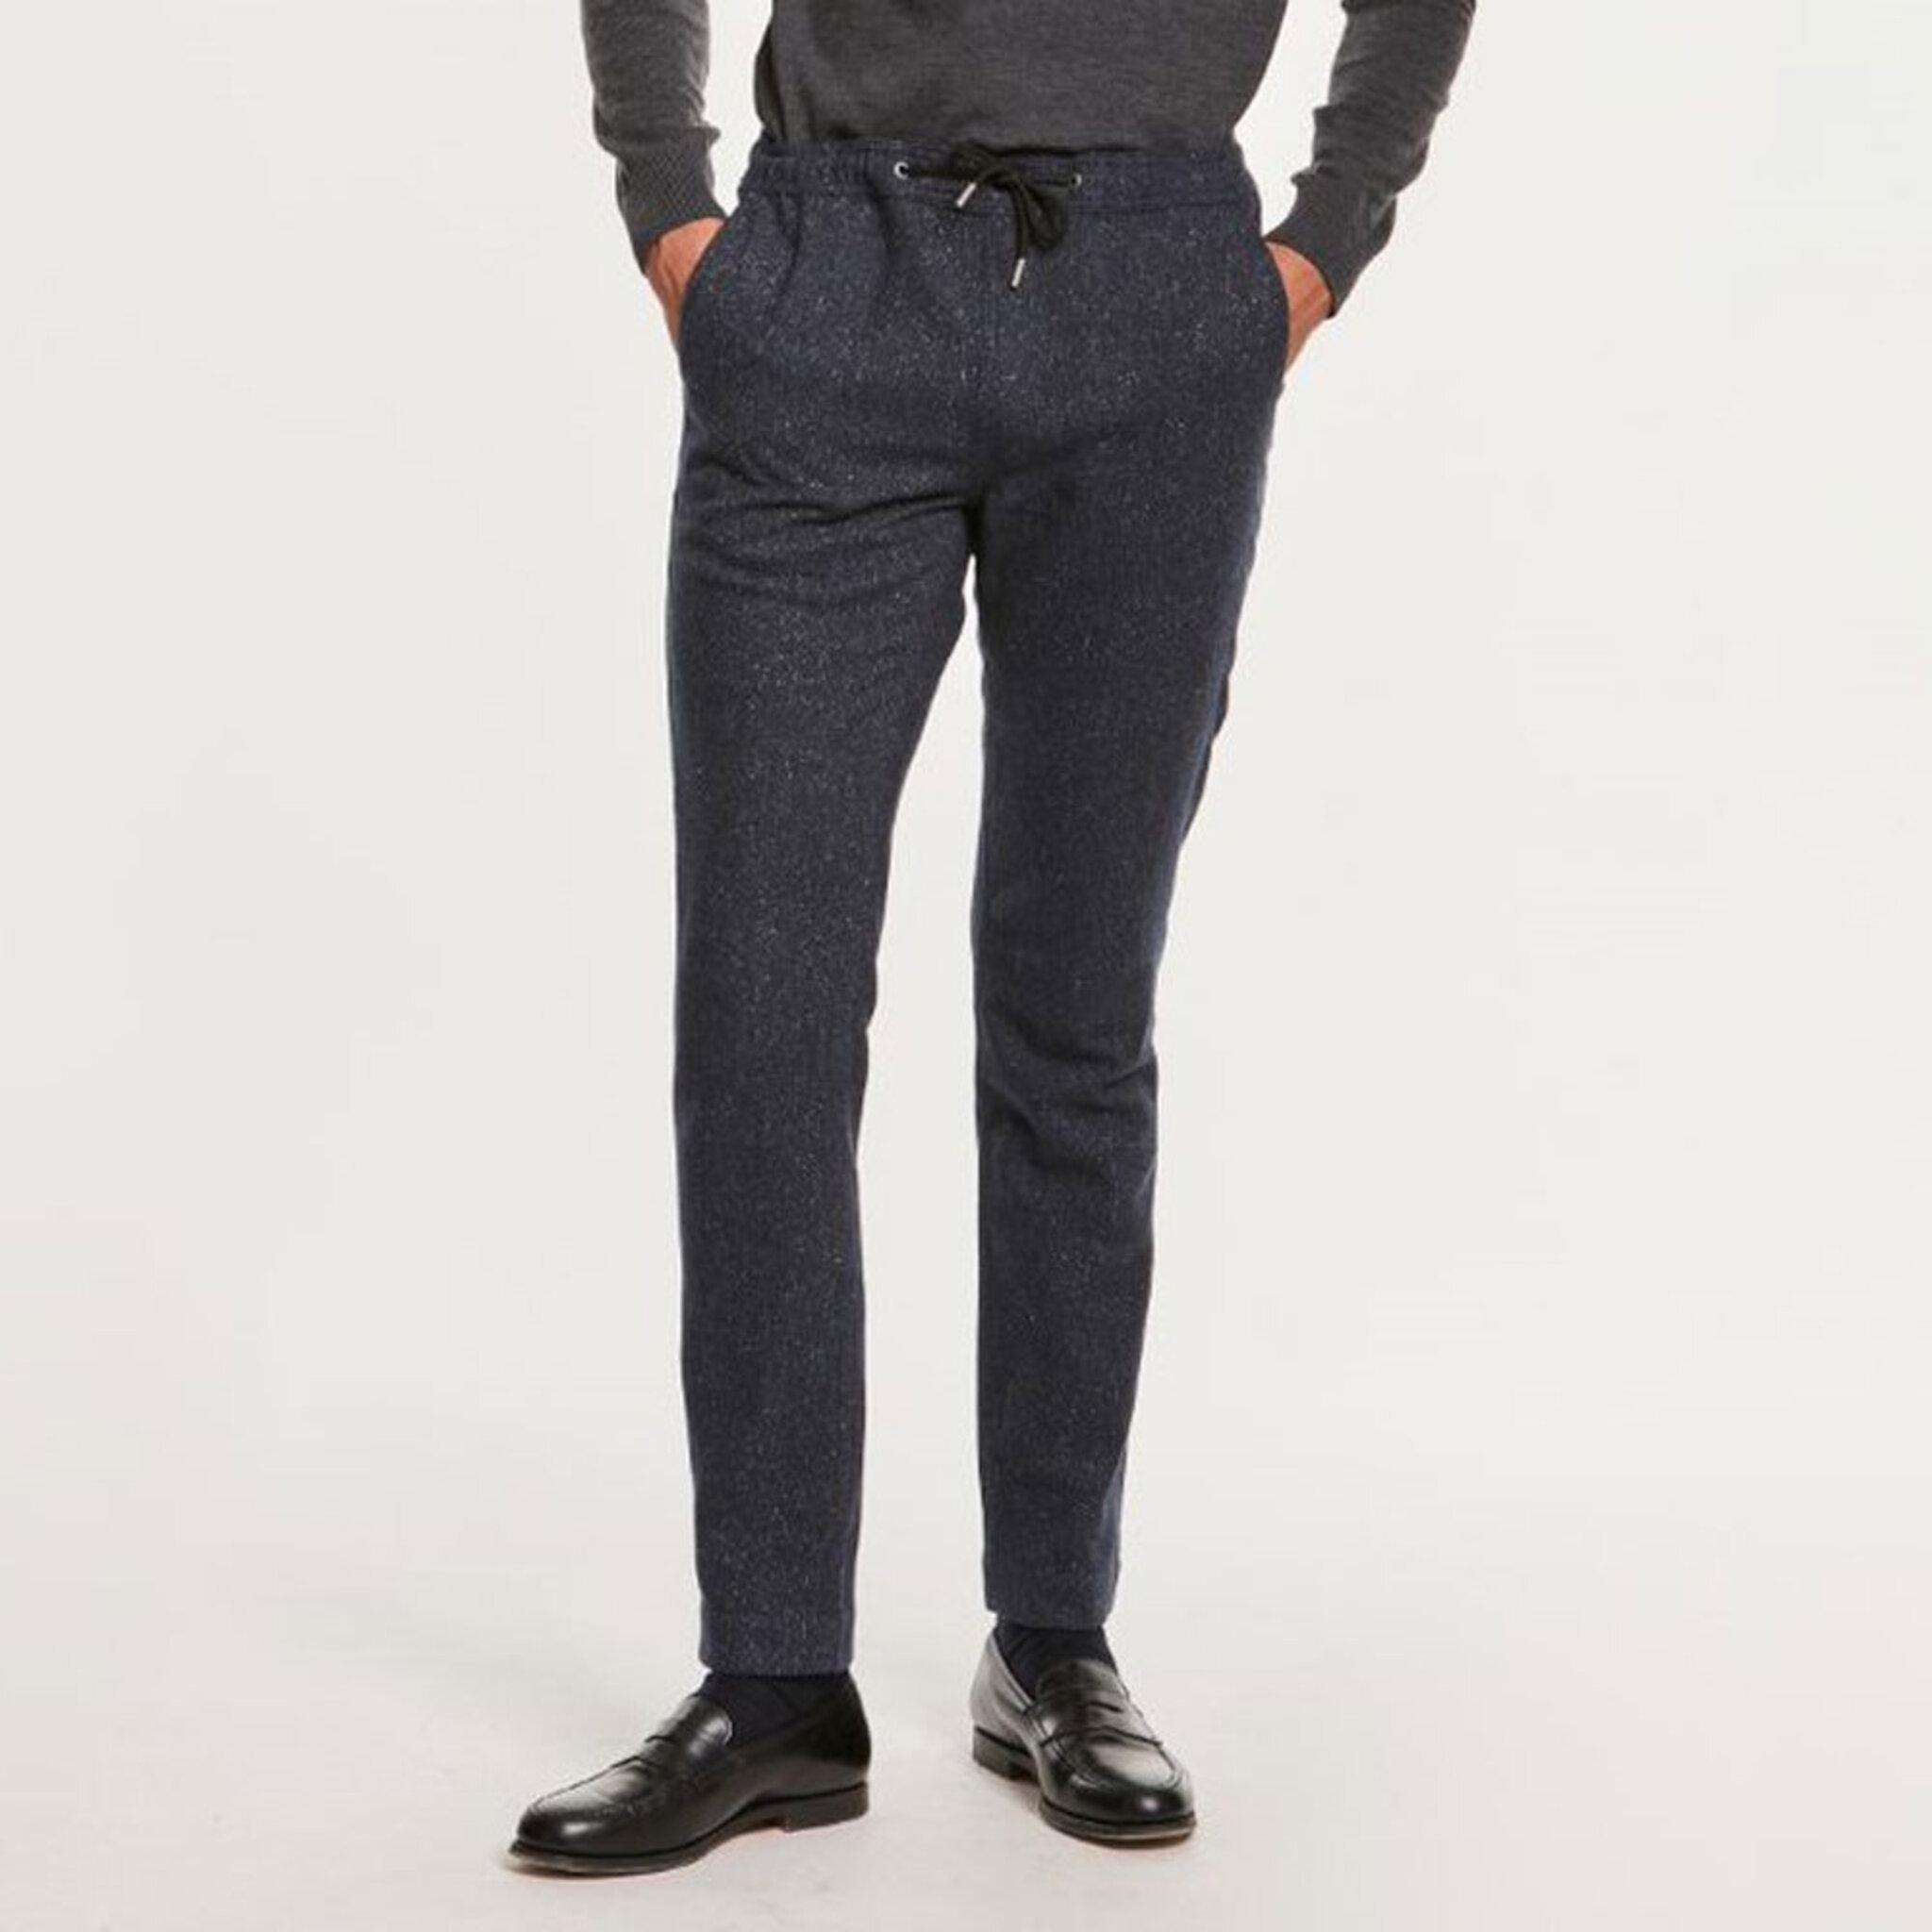 Winward pants